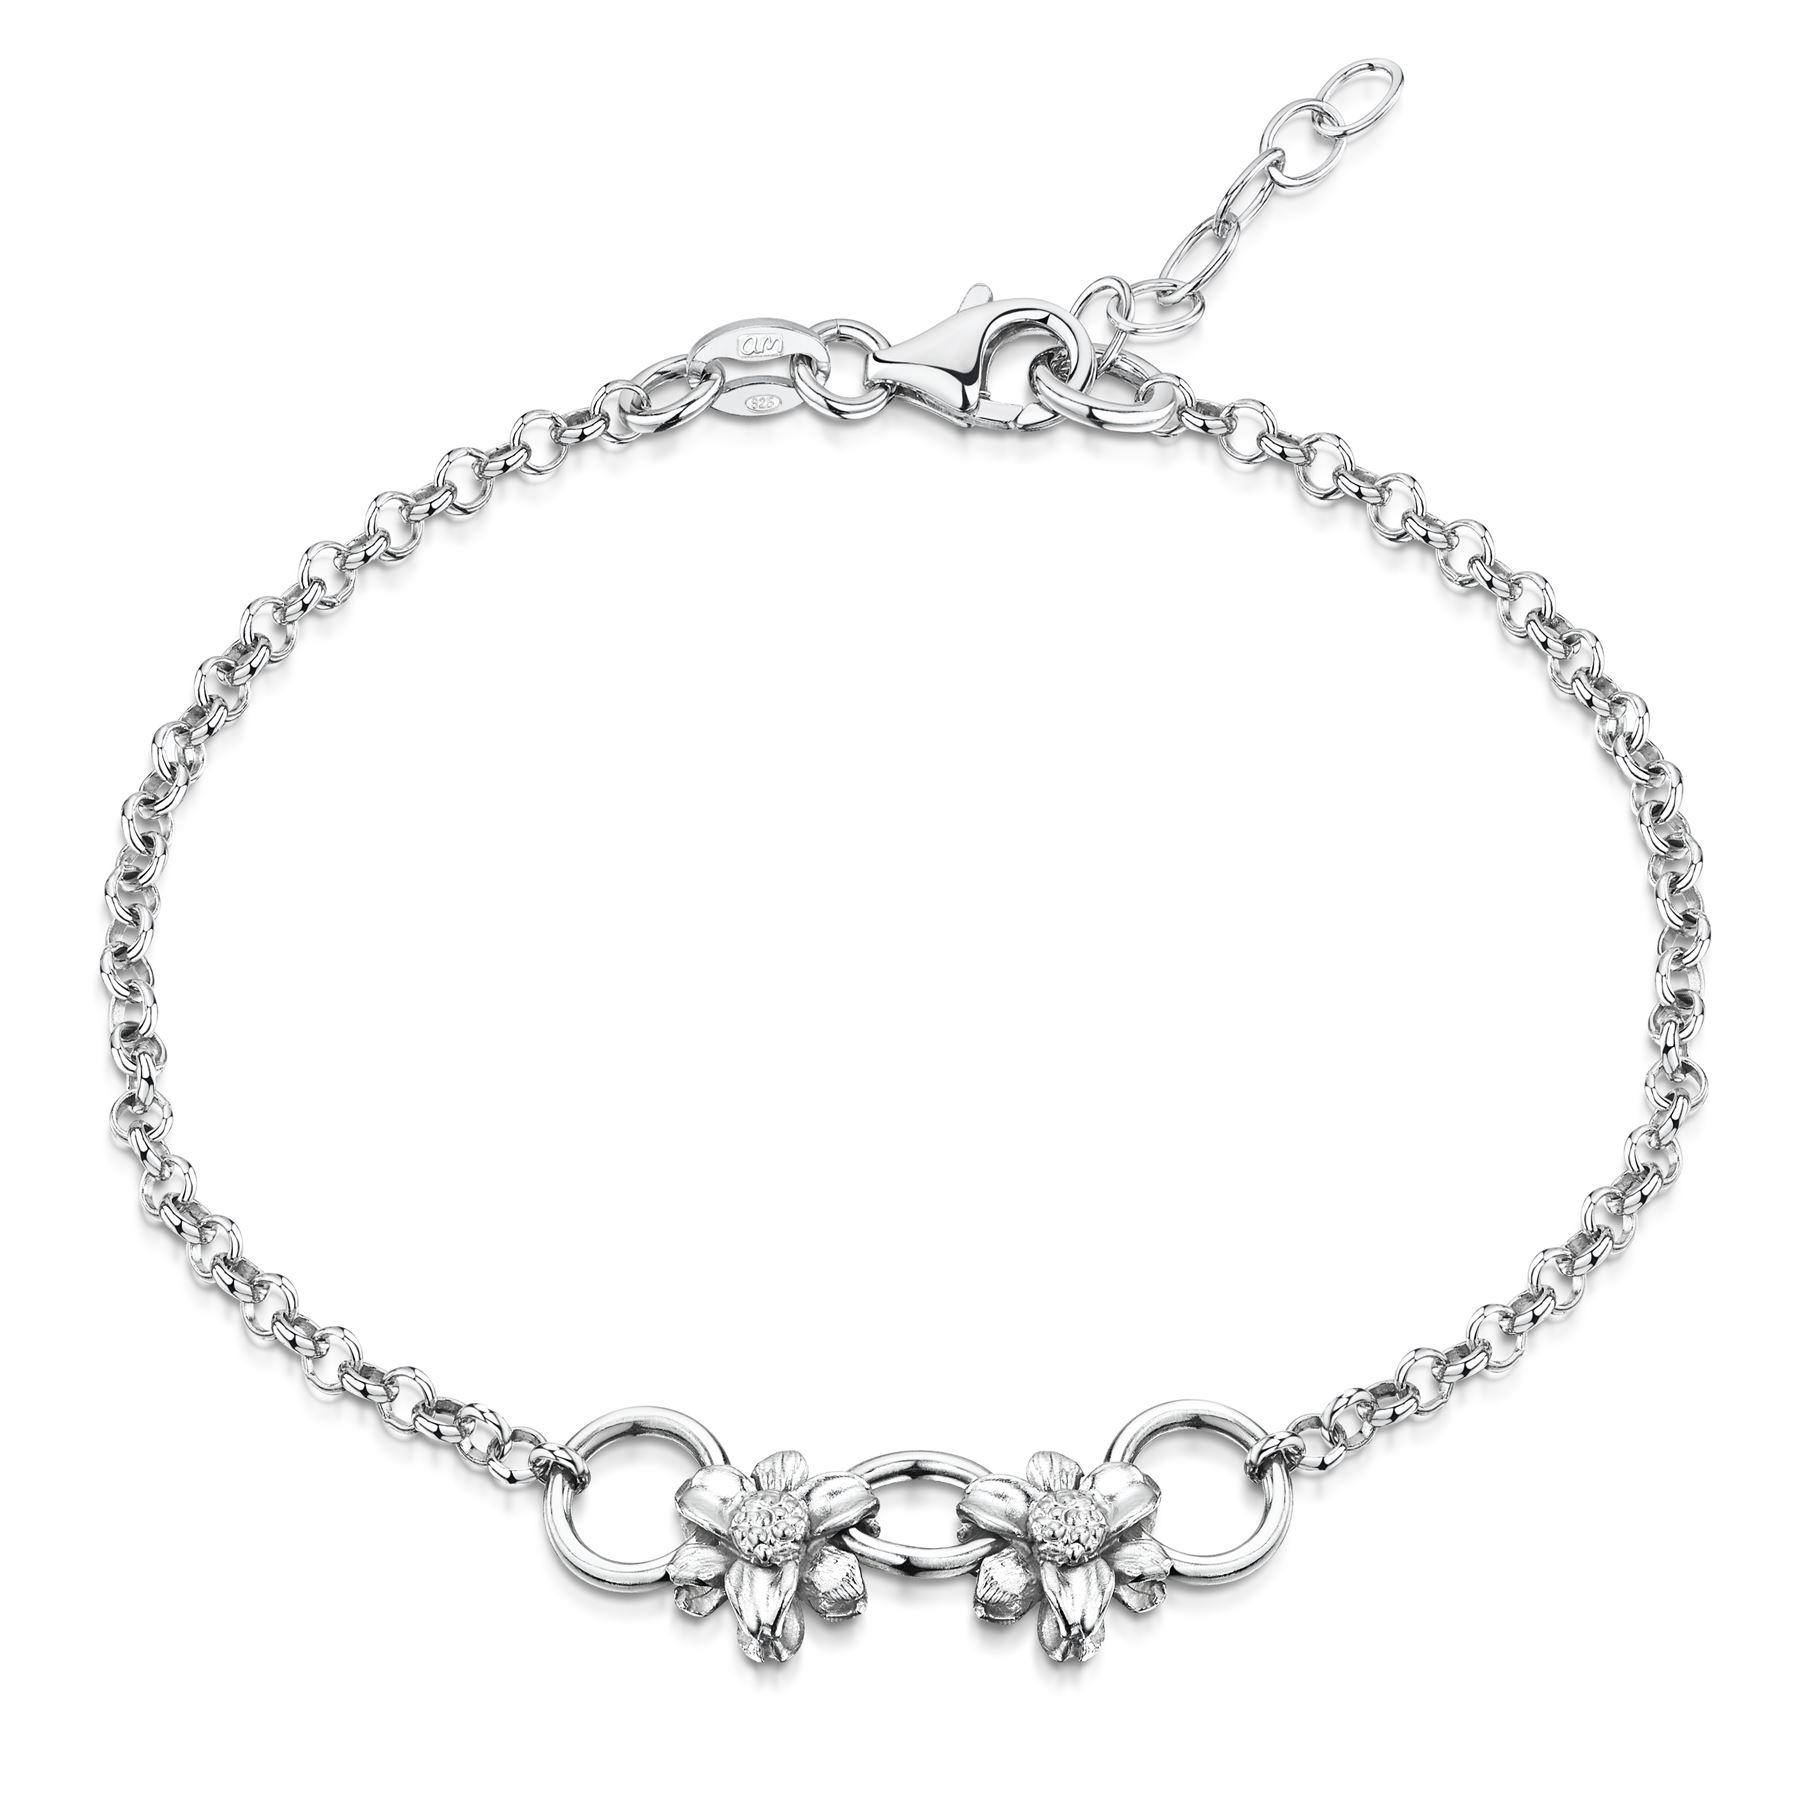 Amberta-Jewelry-925-Sterling-Silver-Adjustable-Bracelet-Italian-Bangle-for-Women thumbnail 77